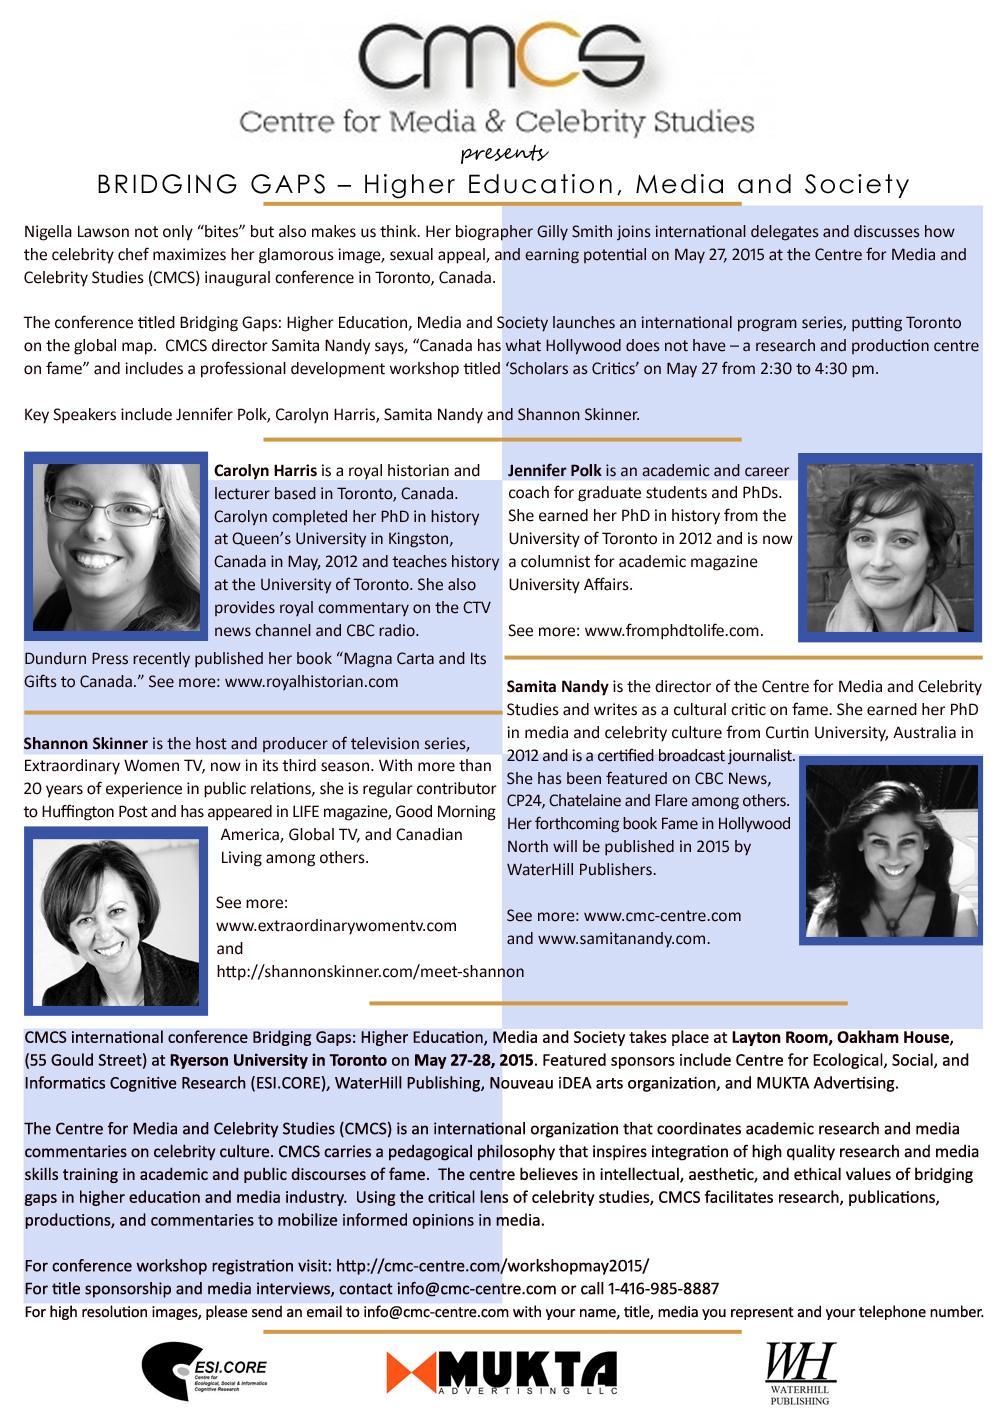 CMCS Press Release – Toronto 2015 | CMCS